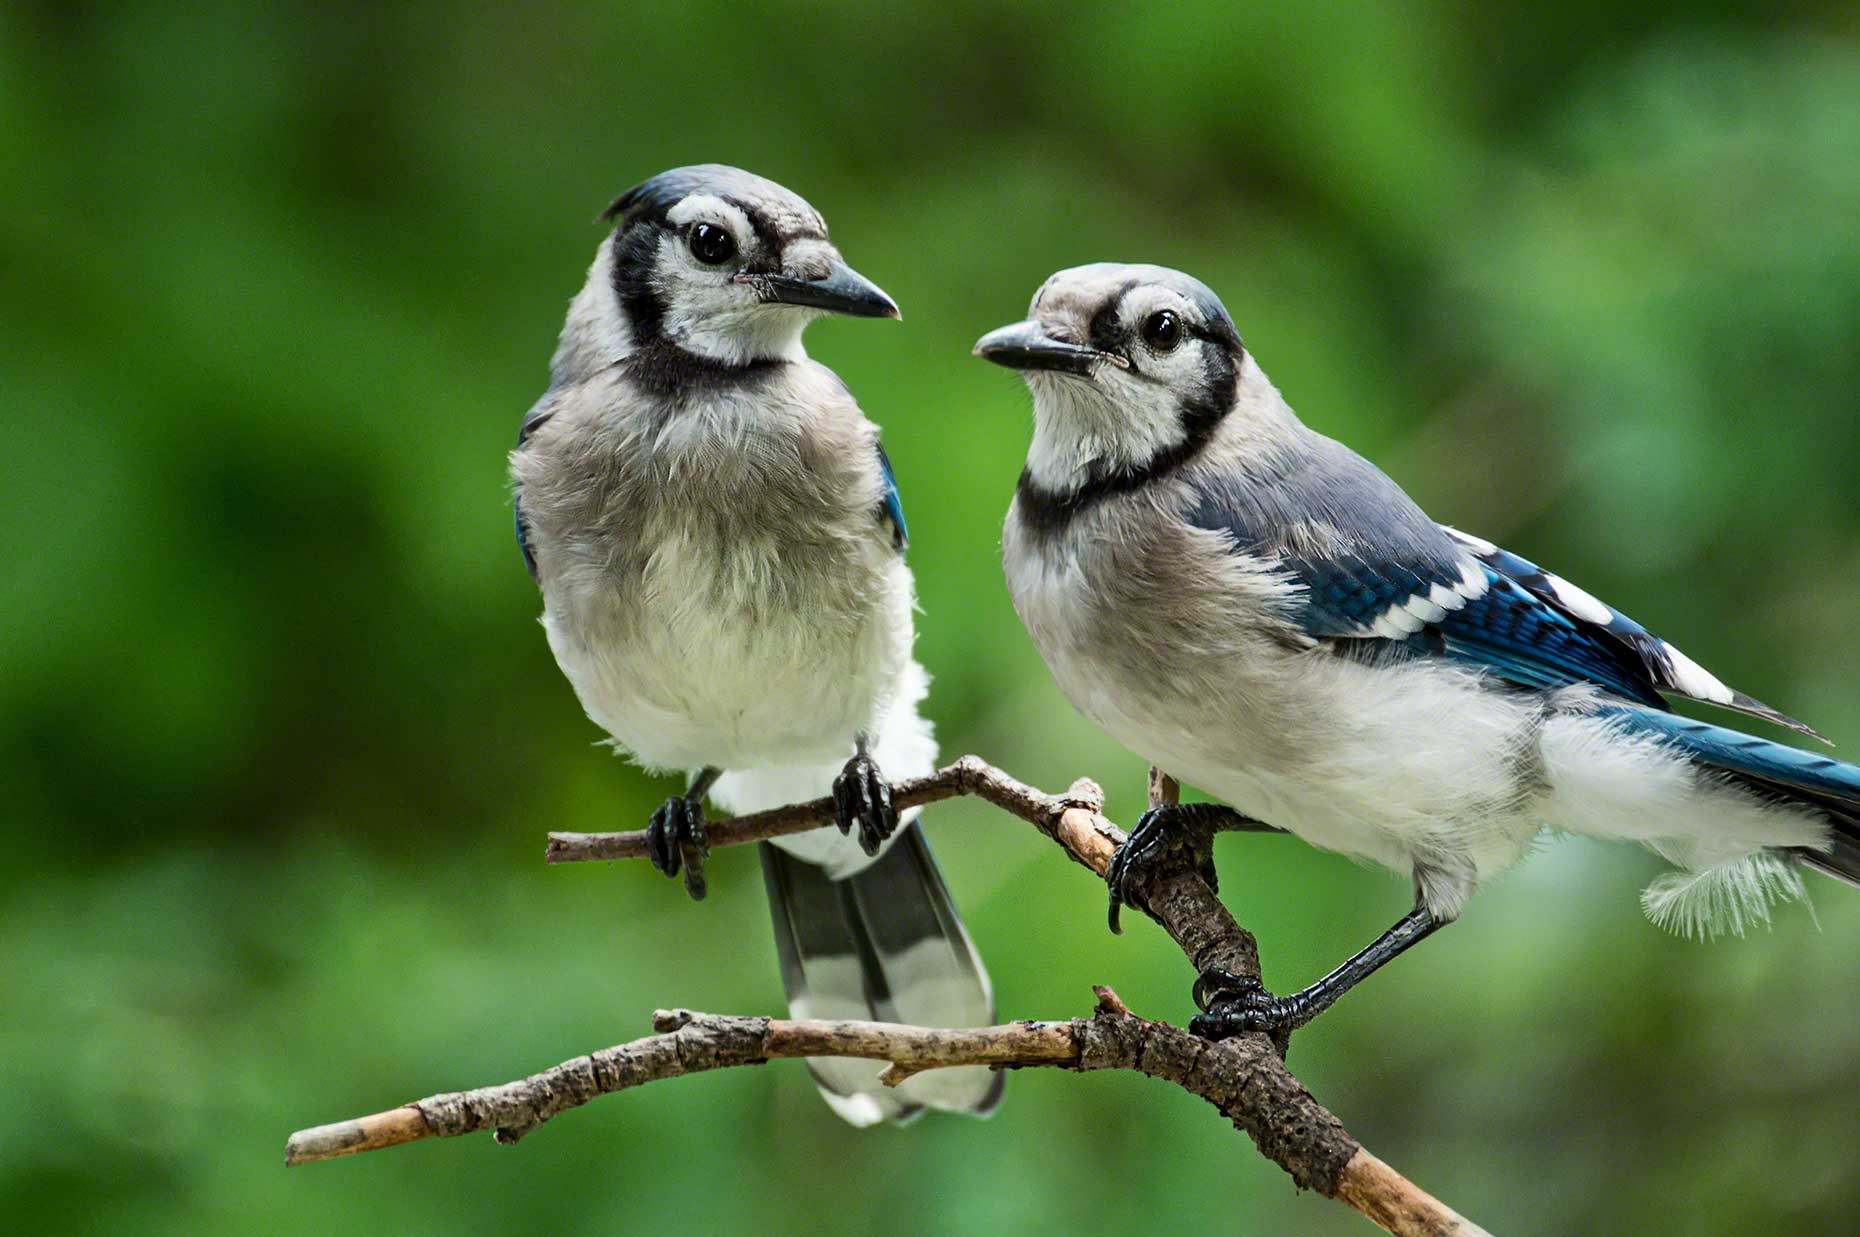 FritzImages | Travel and Outdoor Digital Images | image name = FI 20140730 388 NY Summer Birds Blue Jays